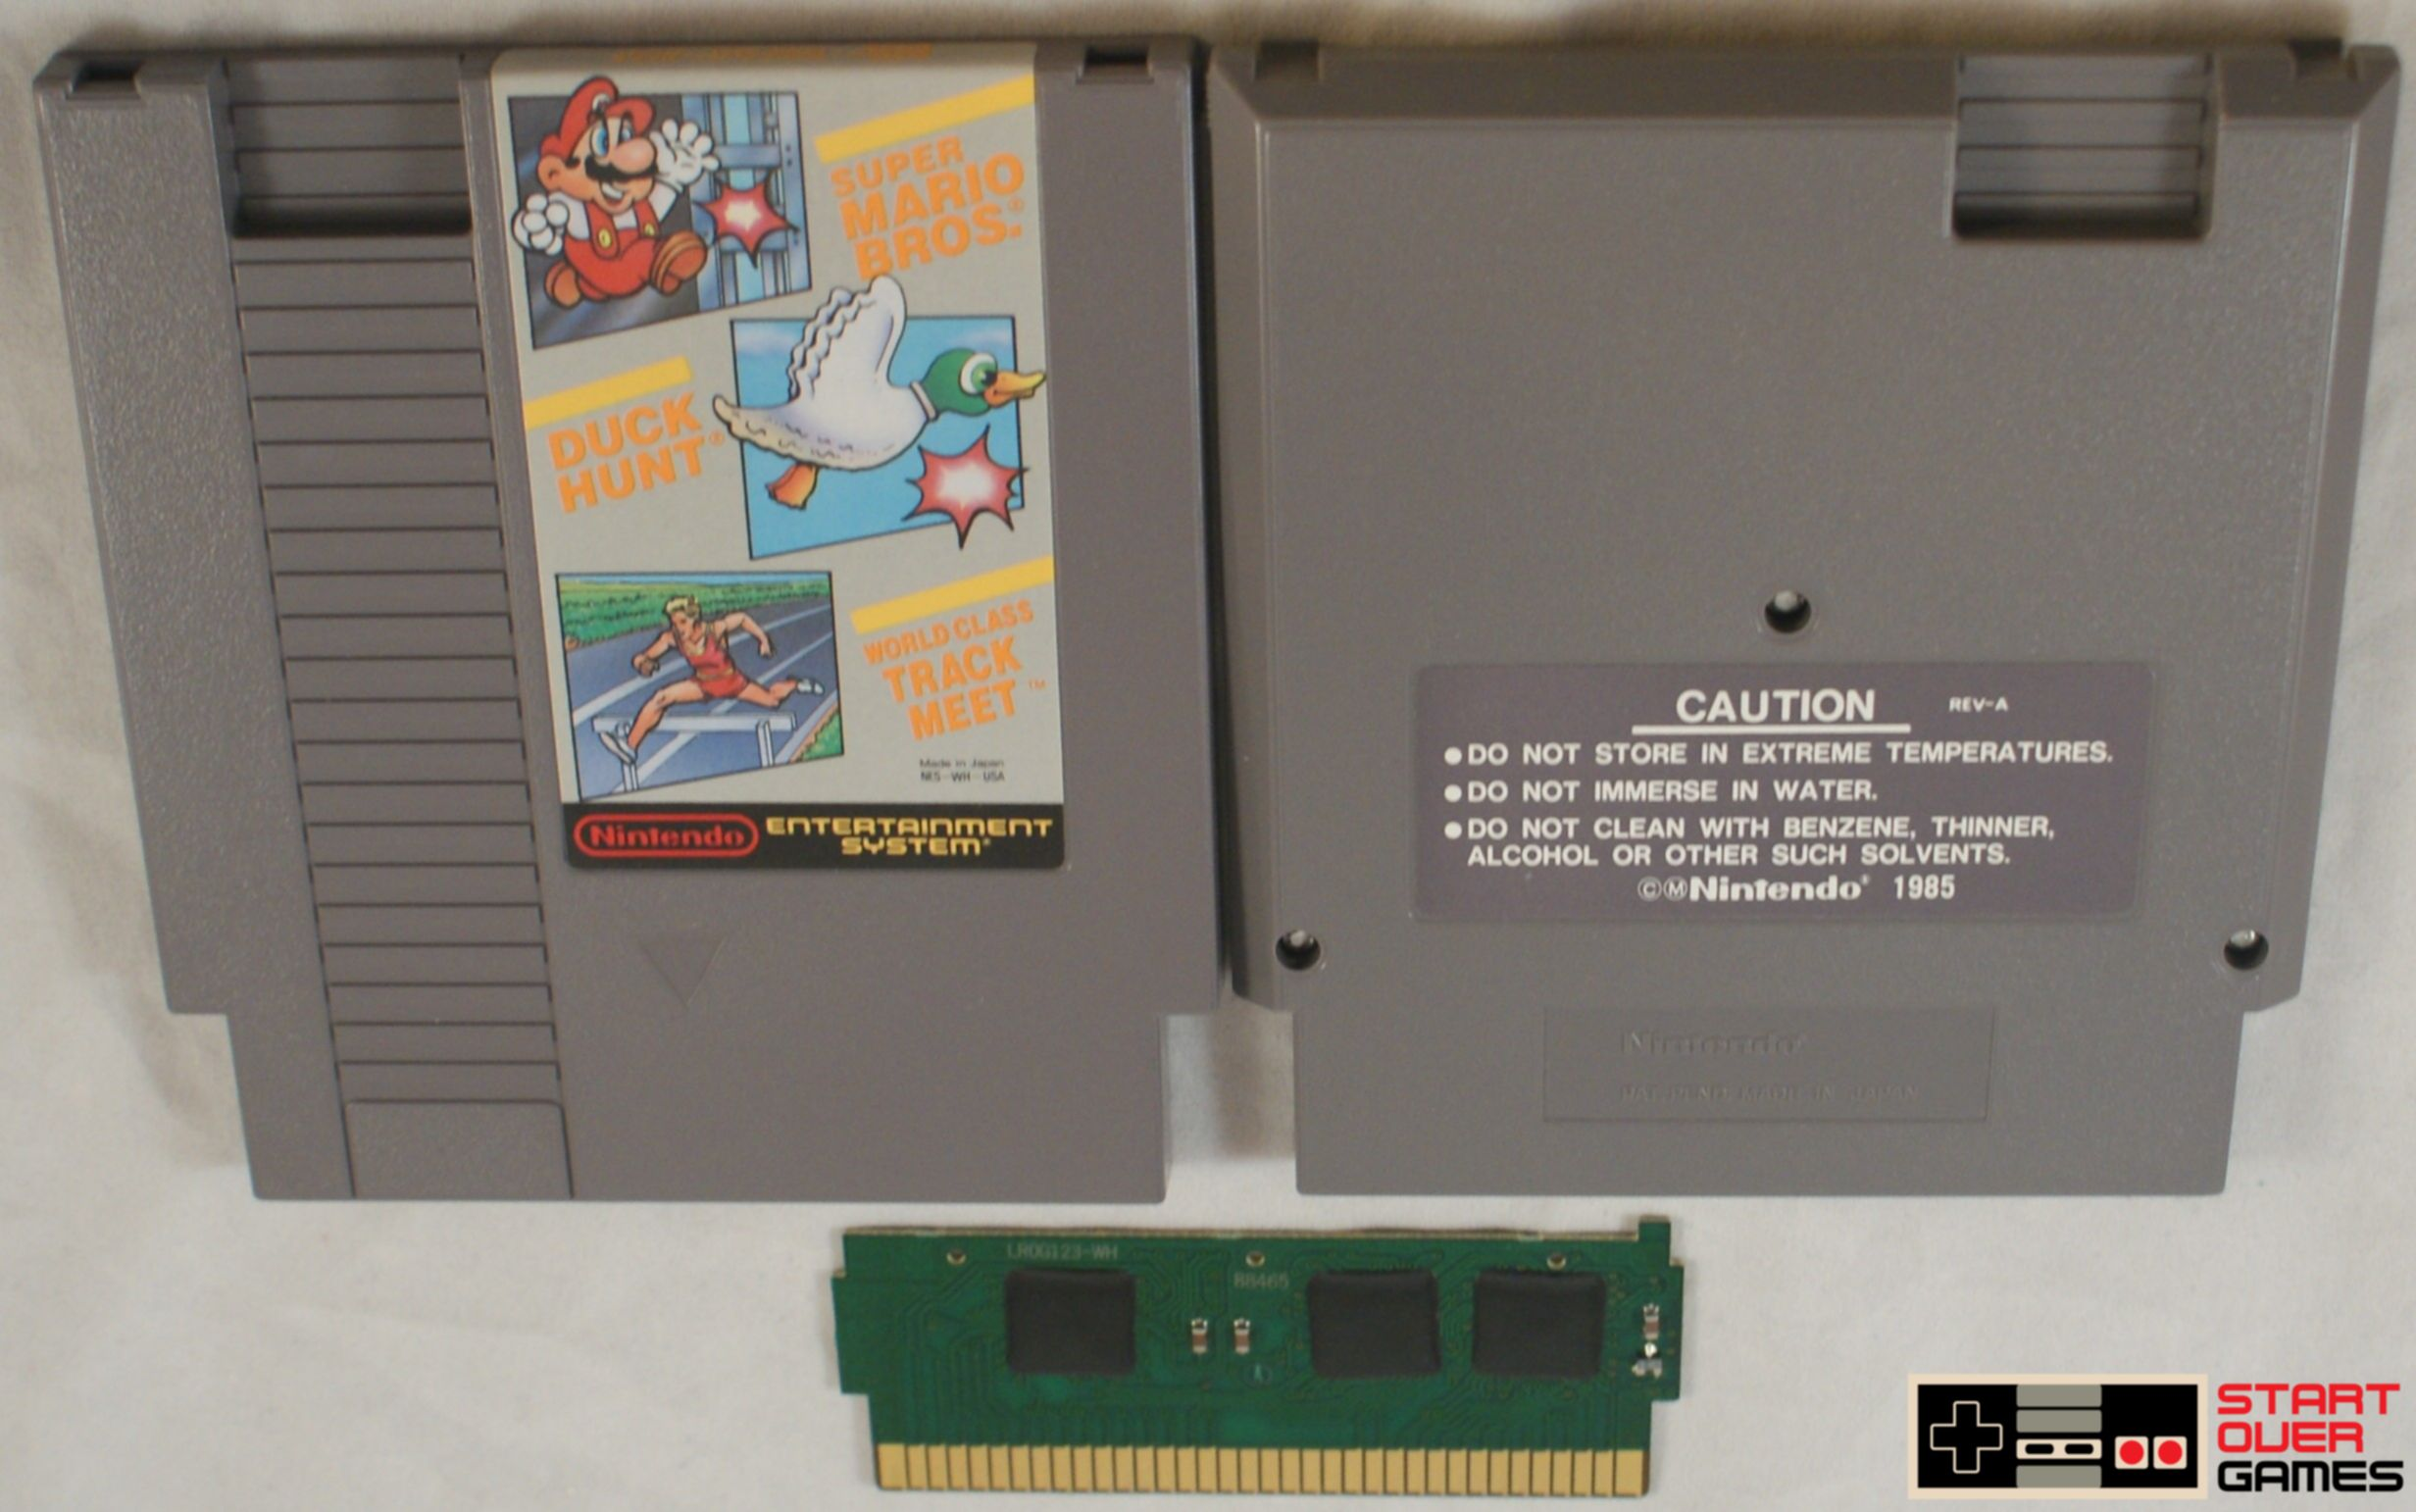 Super Mario Bros Duck Hunt World Class Track for the Nintendo